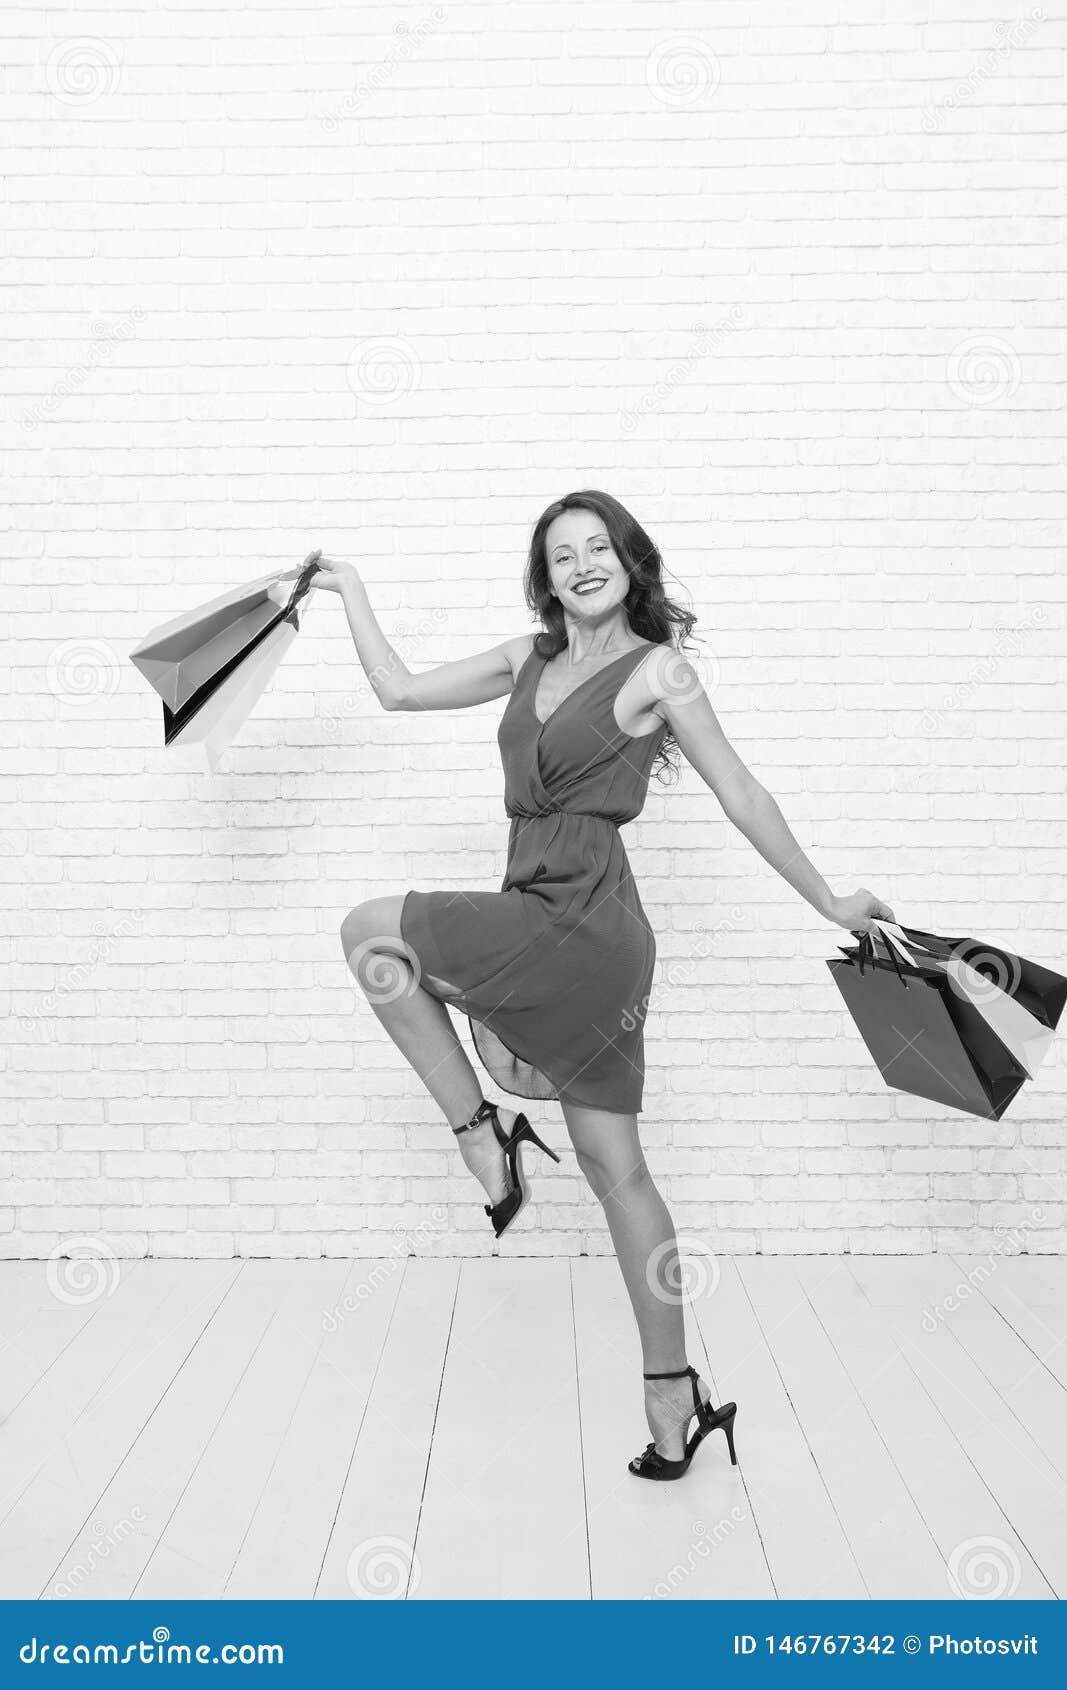 Fashion Black Friday Sales Happy Woman Go Shopping Happy Shopping Online Happy Holidays Last Preparations Big Sale Stock Photo Image Of Consumerism Ideas 146767342